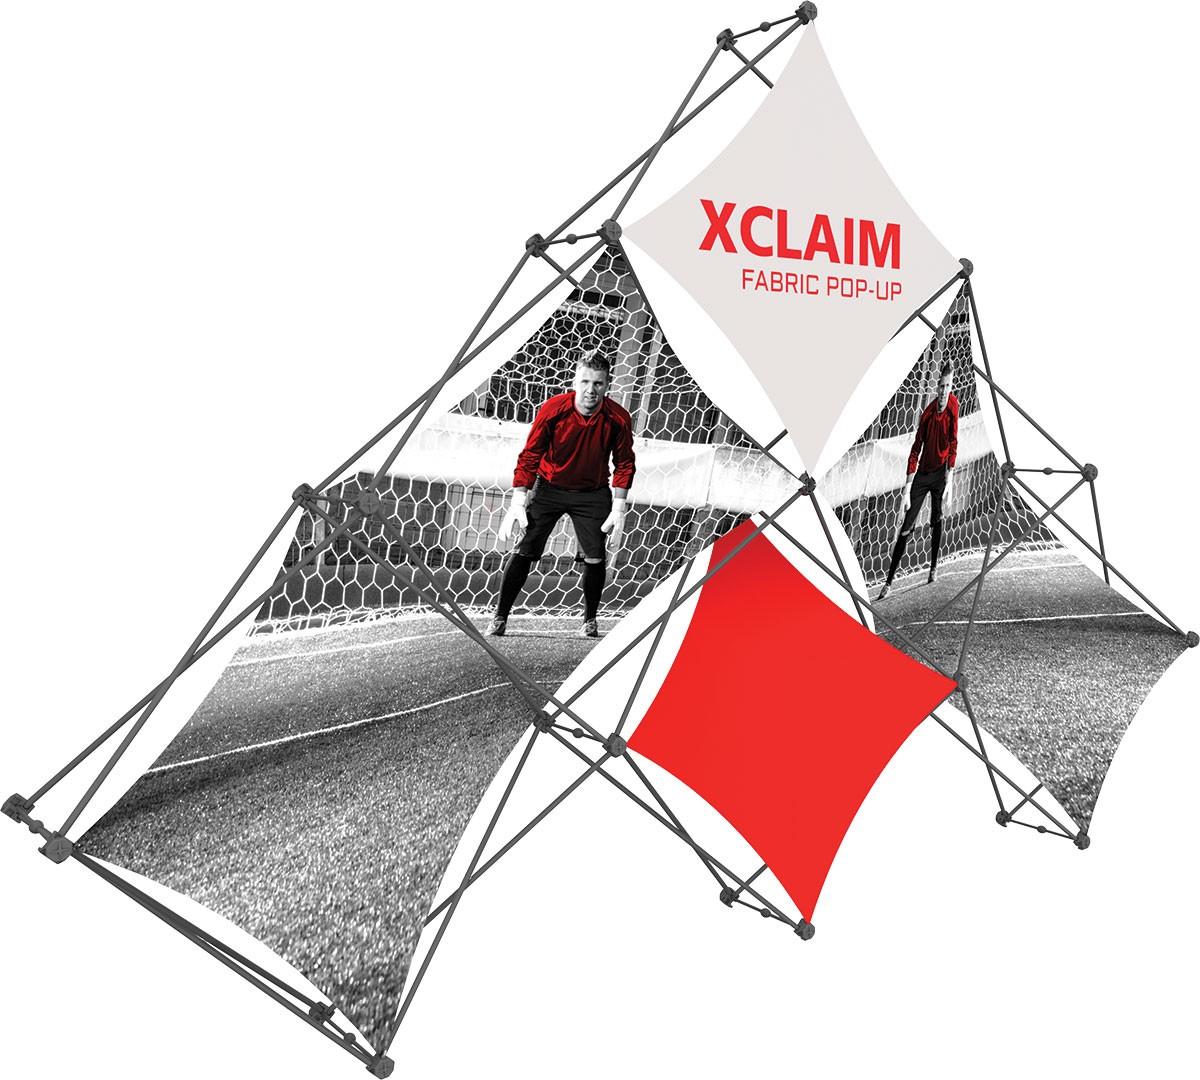 XClaim 6 Quad Pyramid Fabric Pop Up Display Kit 1